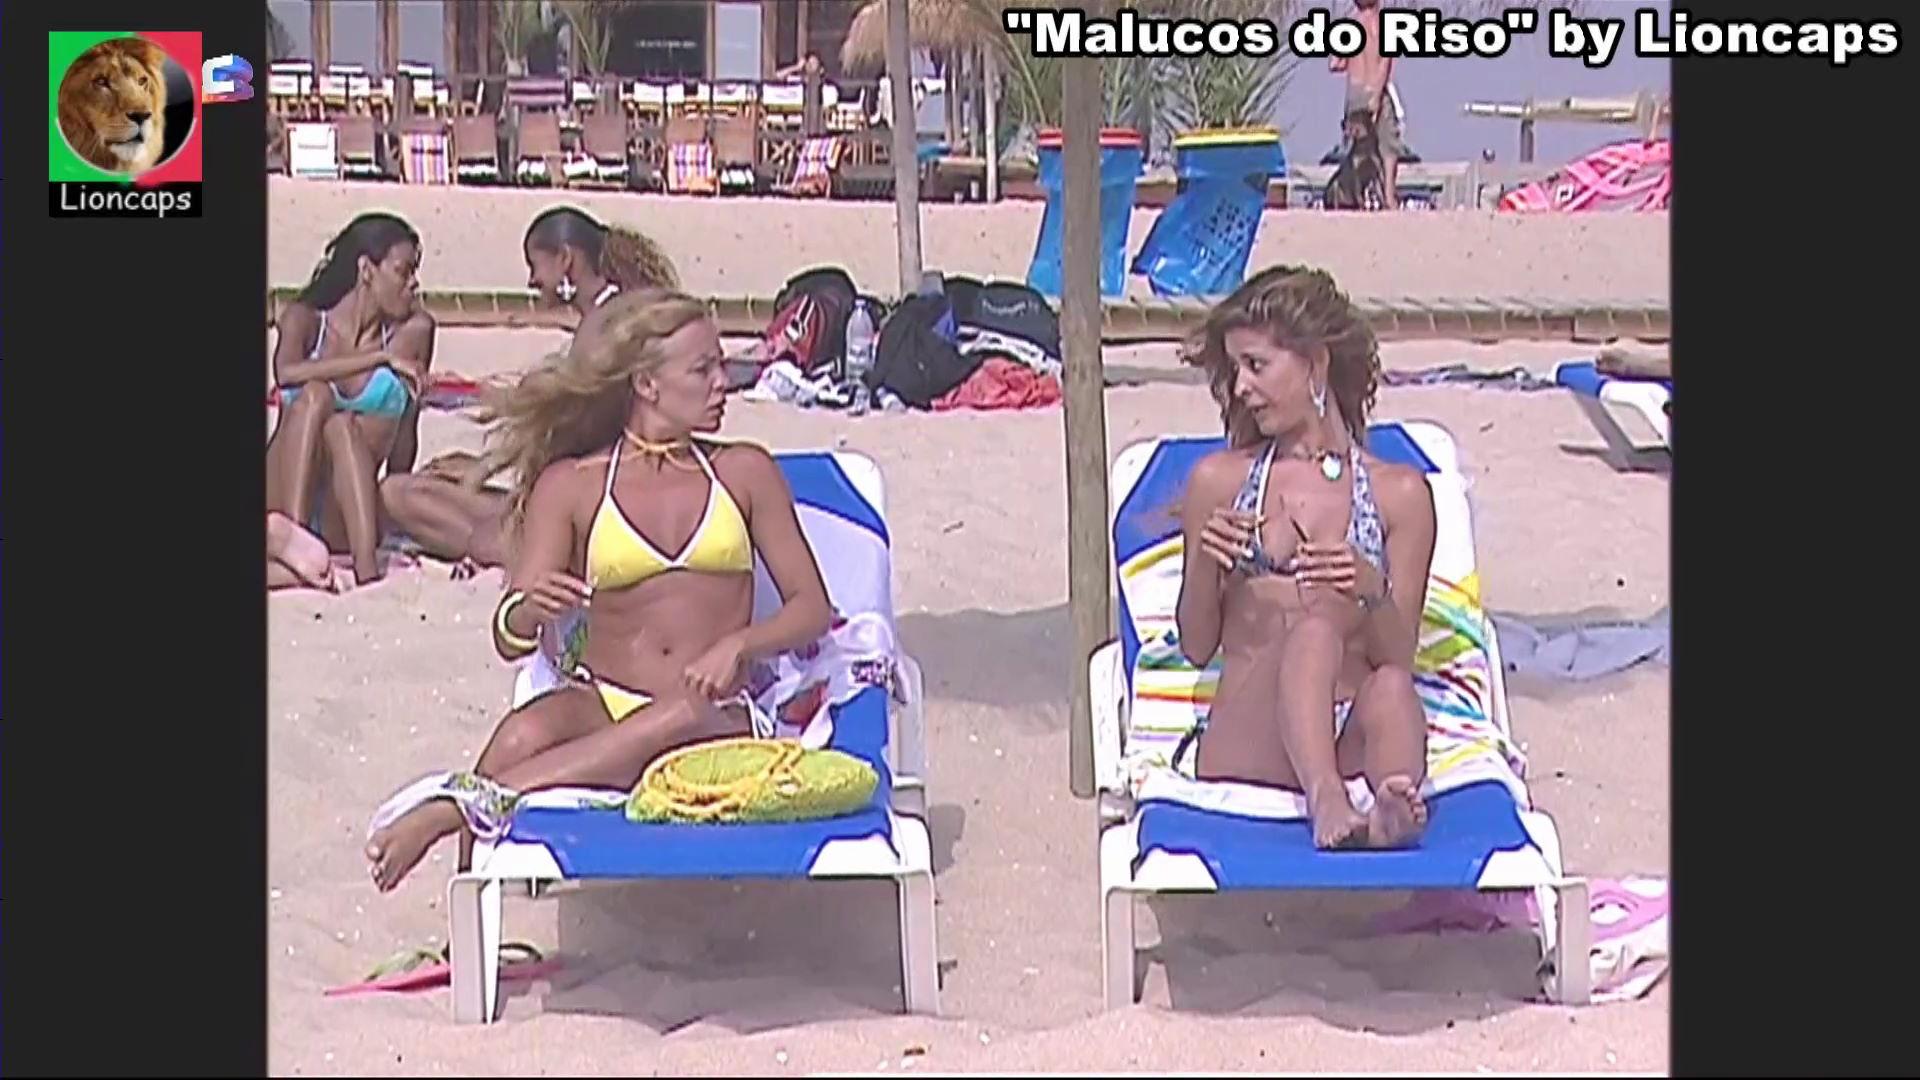 475192995_malucos_riso_alda_gomes_vs190malucos_riso_602_15091_122_582lo.JPG